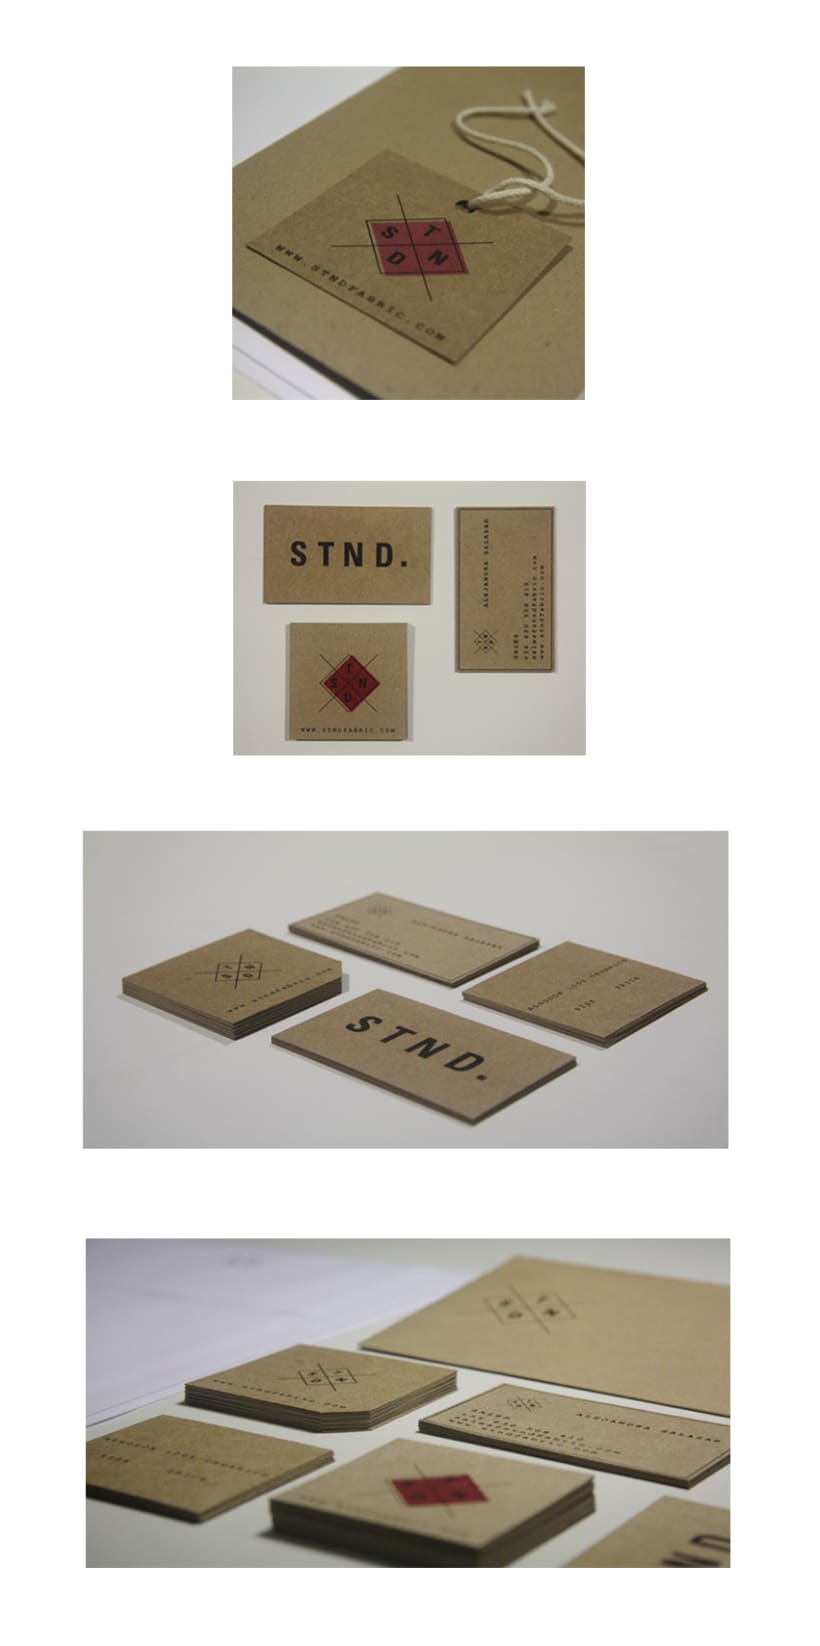 STND 1